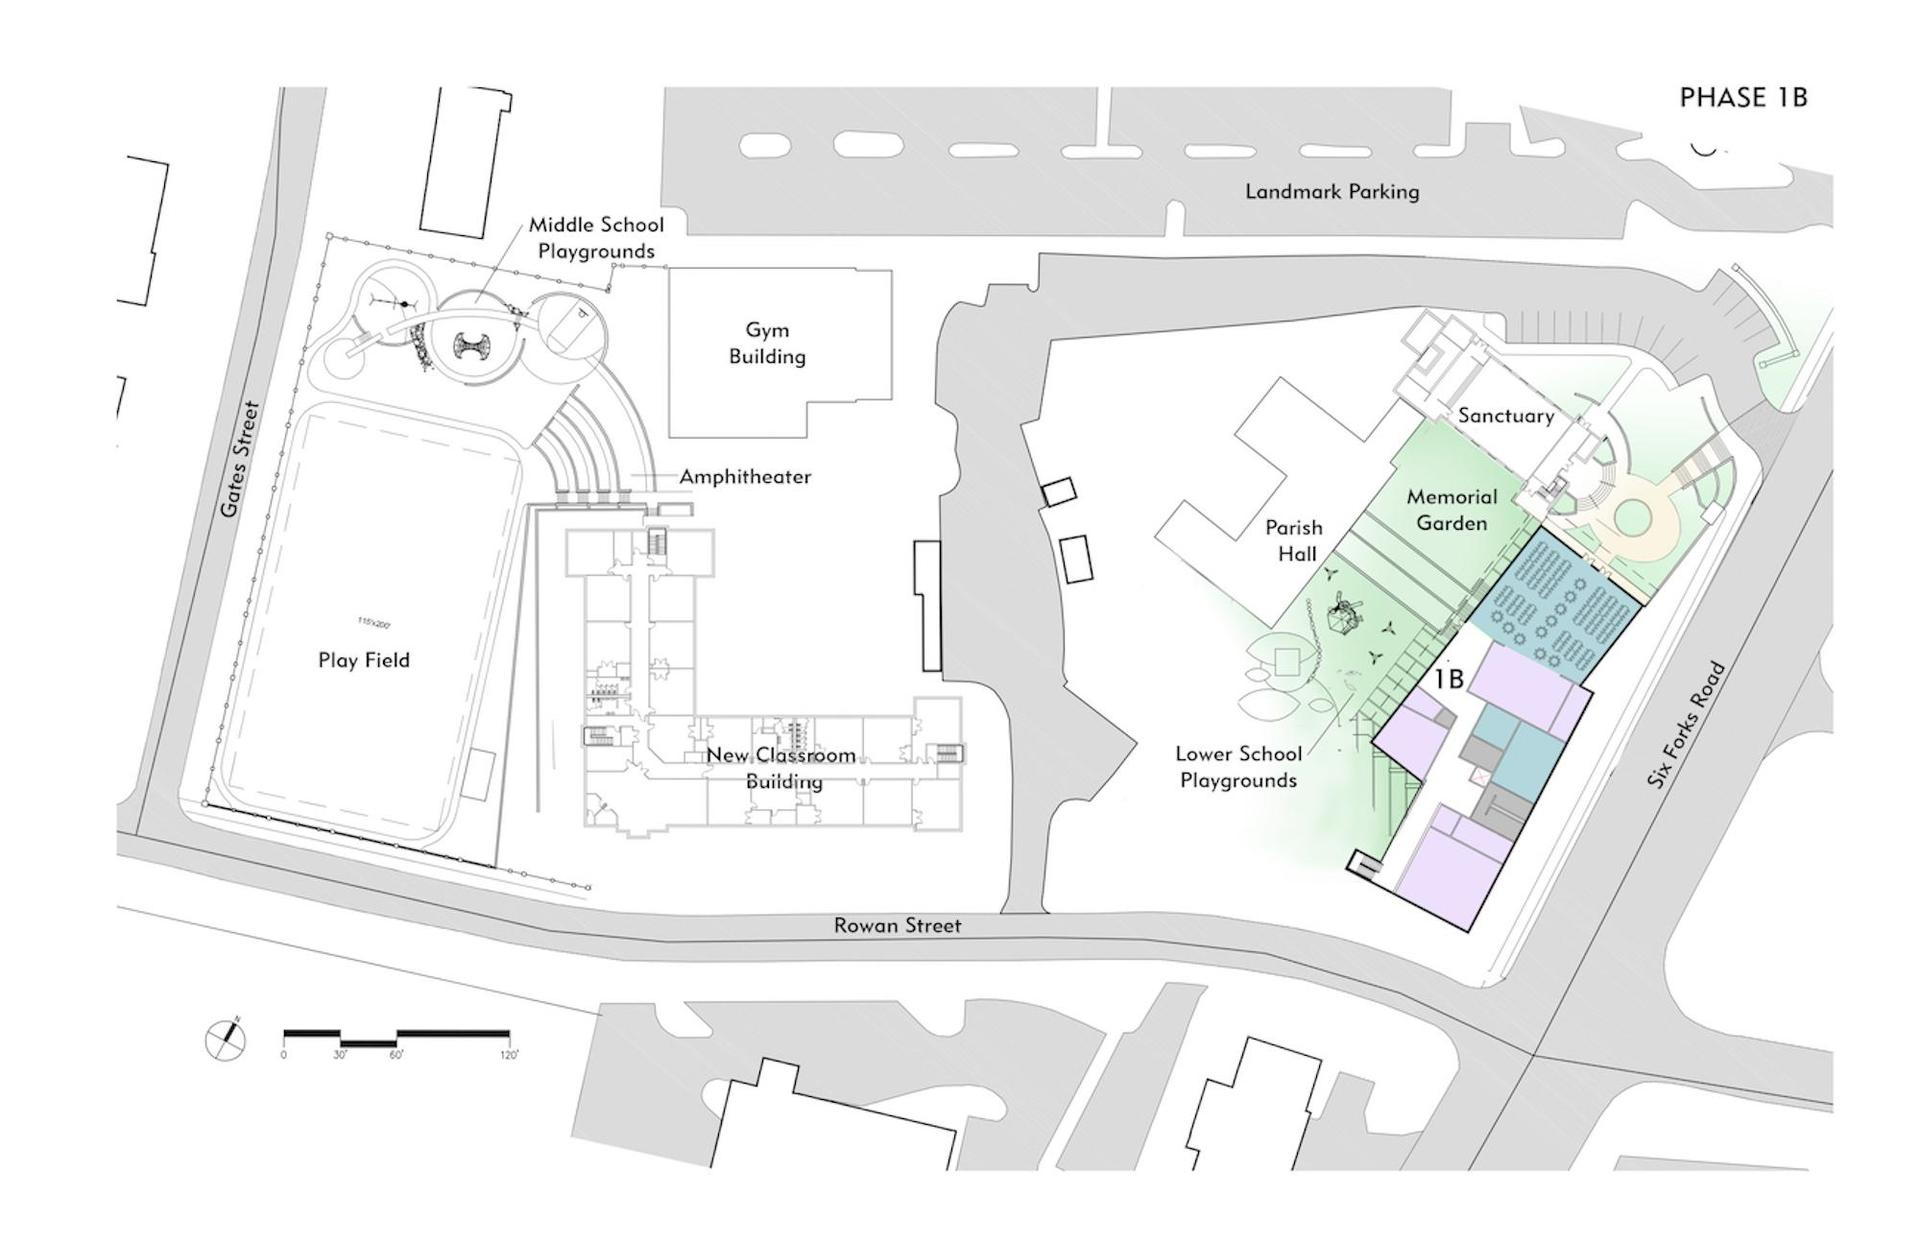 Phase 1B site plan